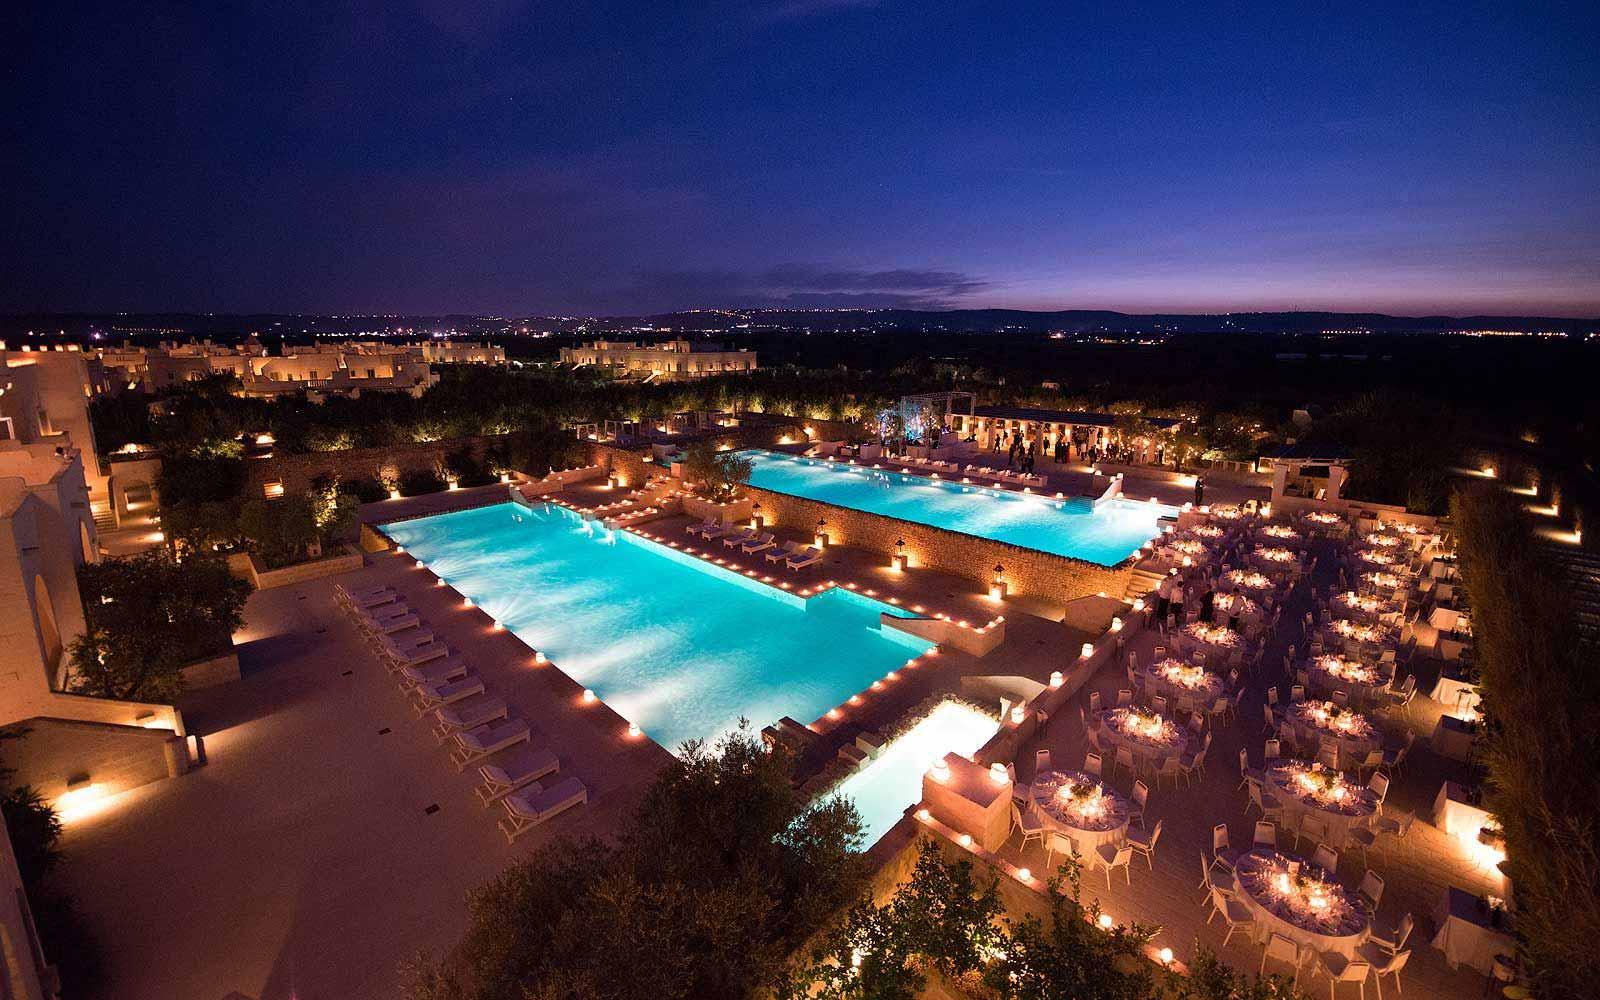 Nighttime panoramic view of the Borgo Egnazia